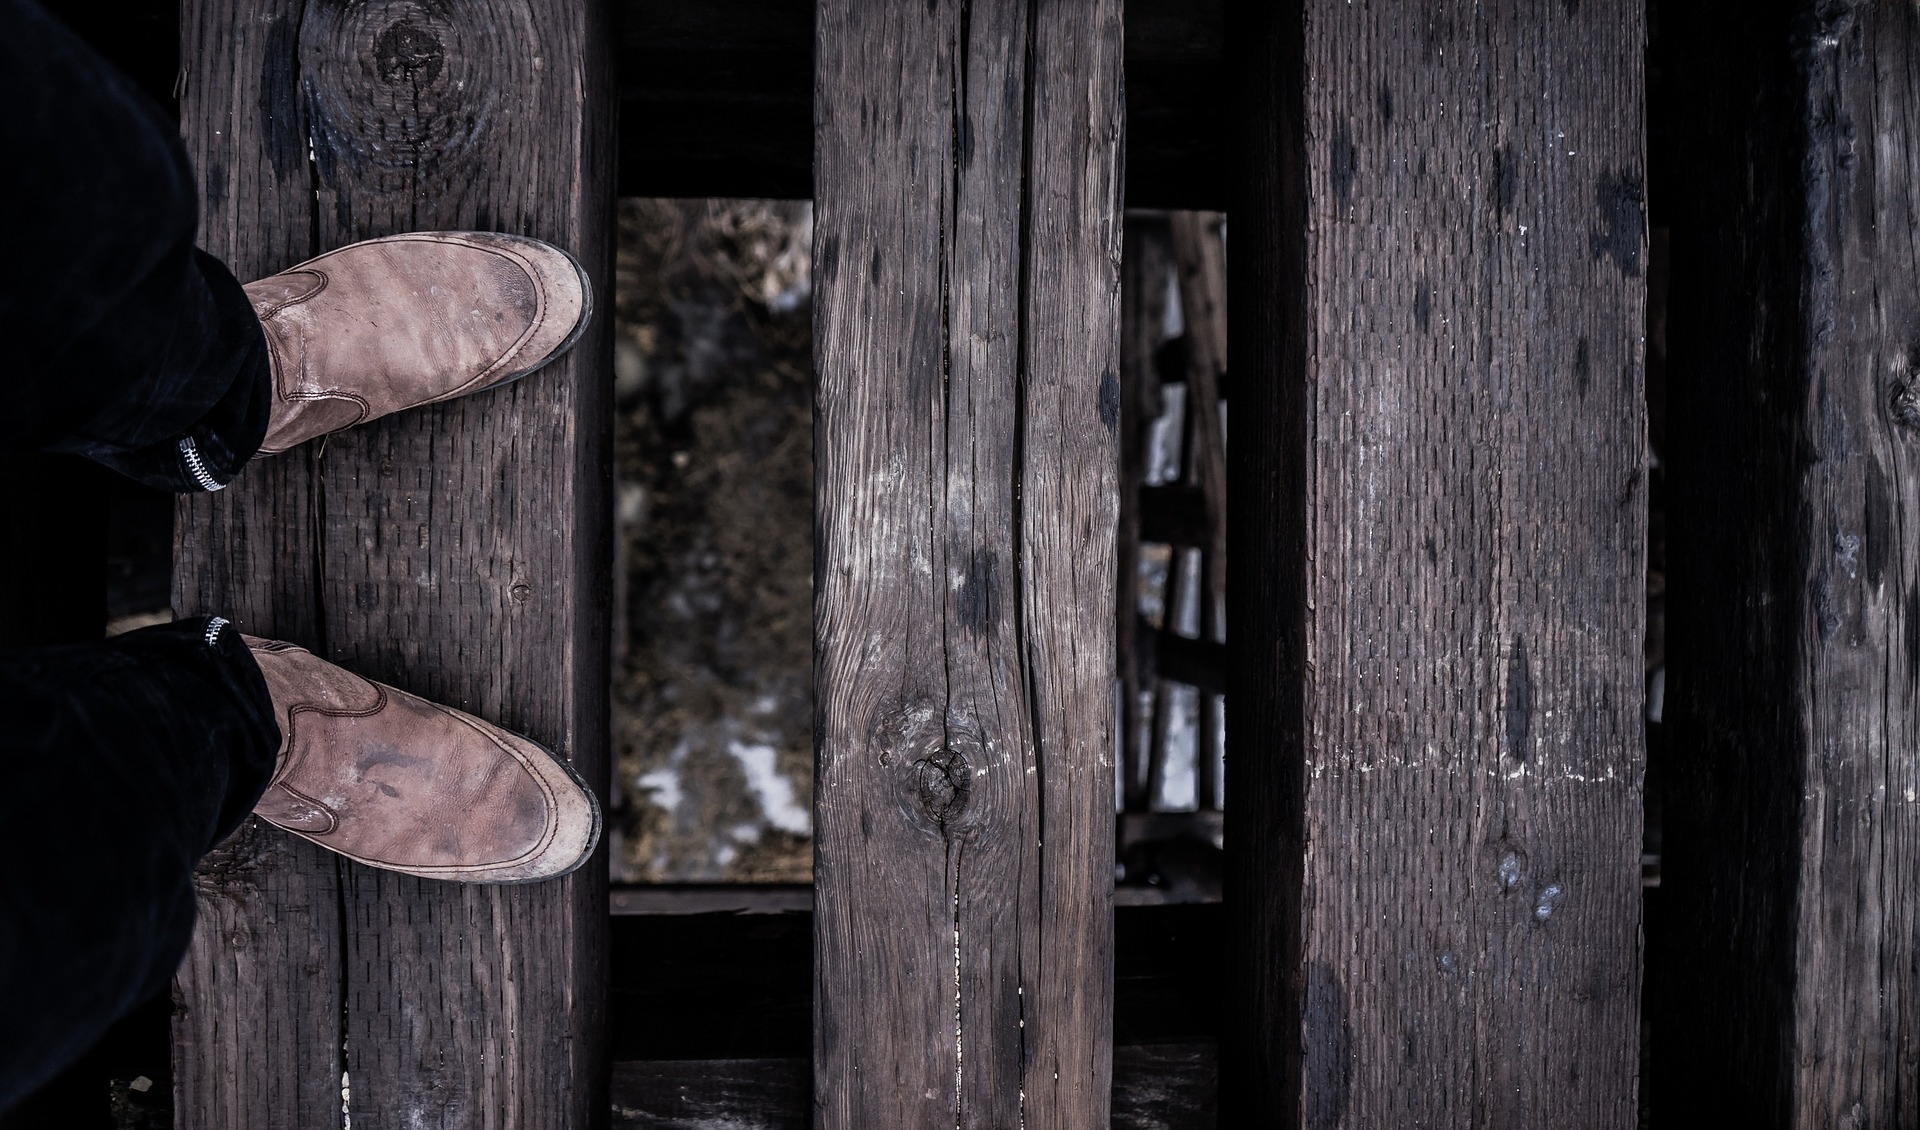 feet-1245957_1920.jpg